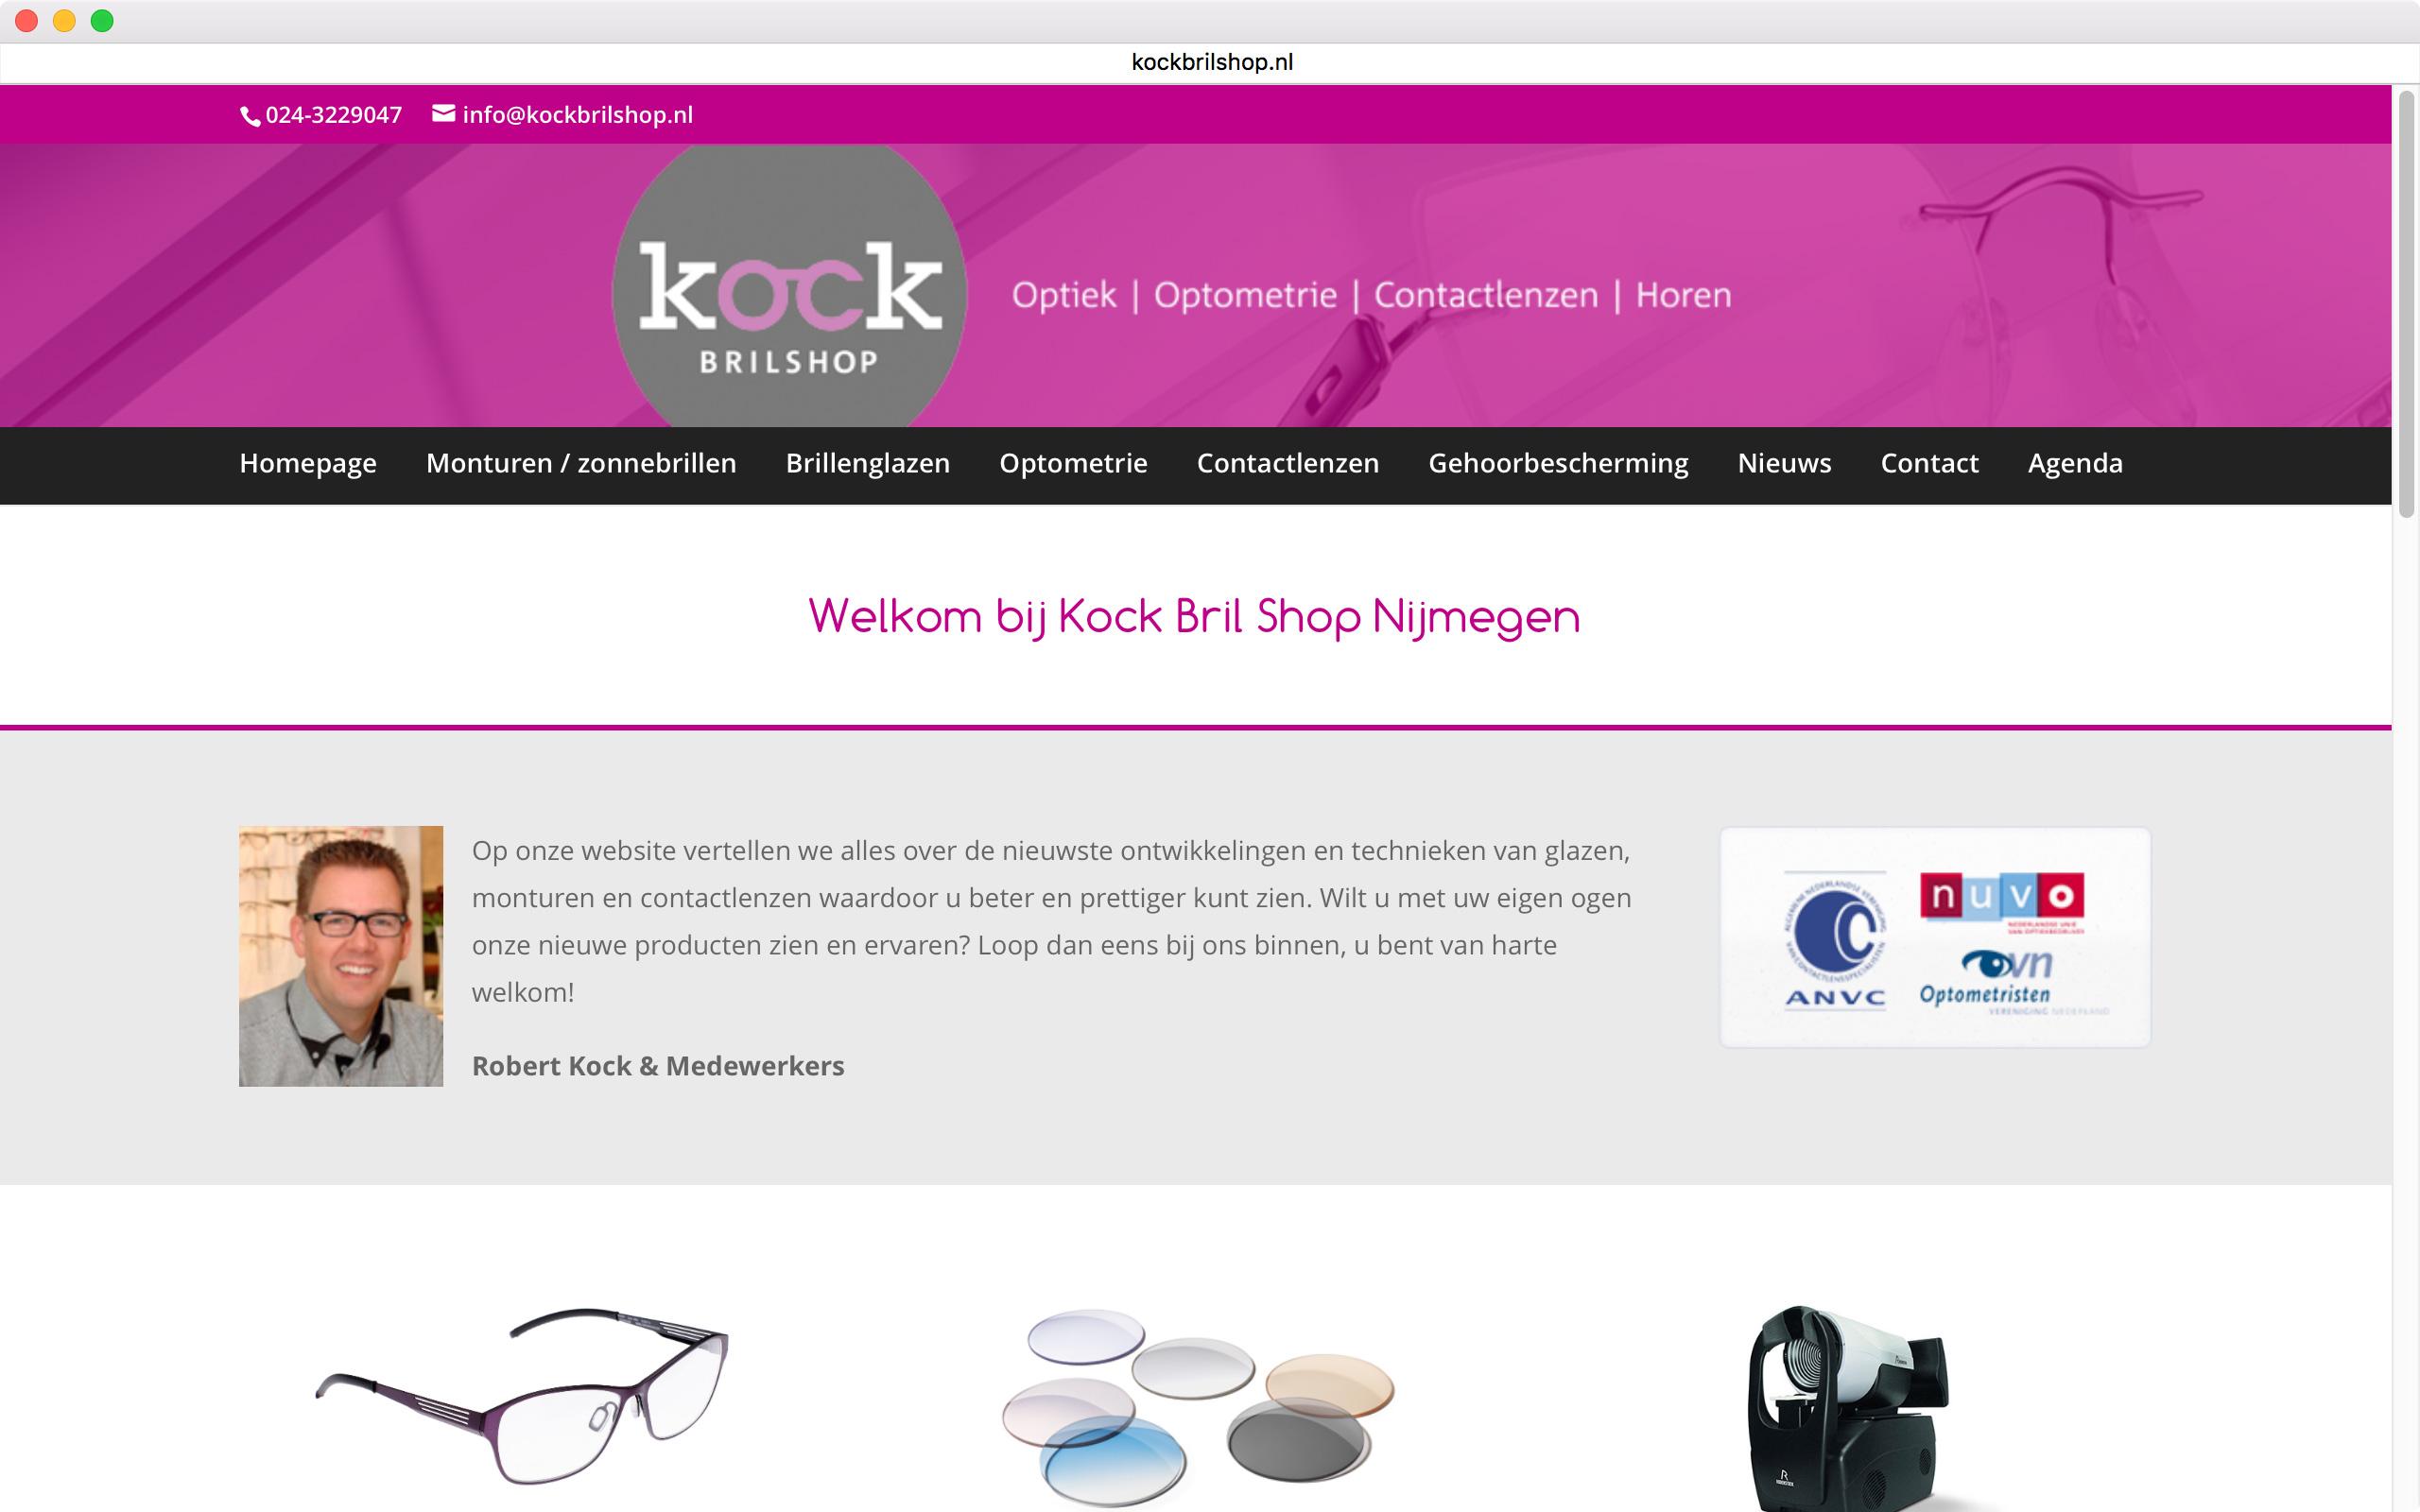 Kock Bril Shop